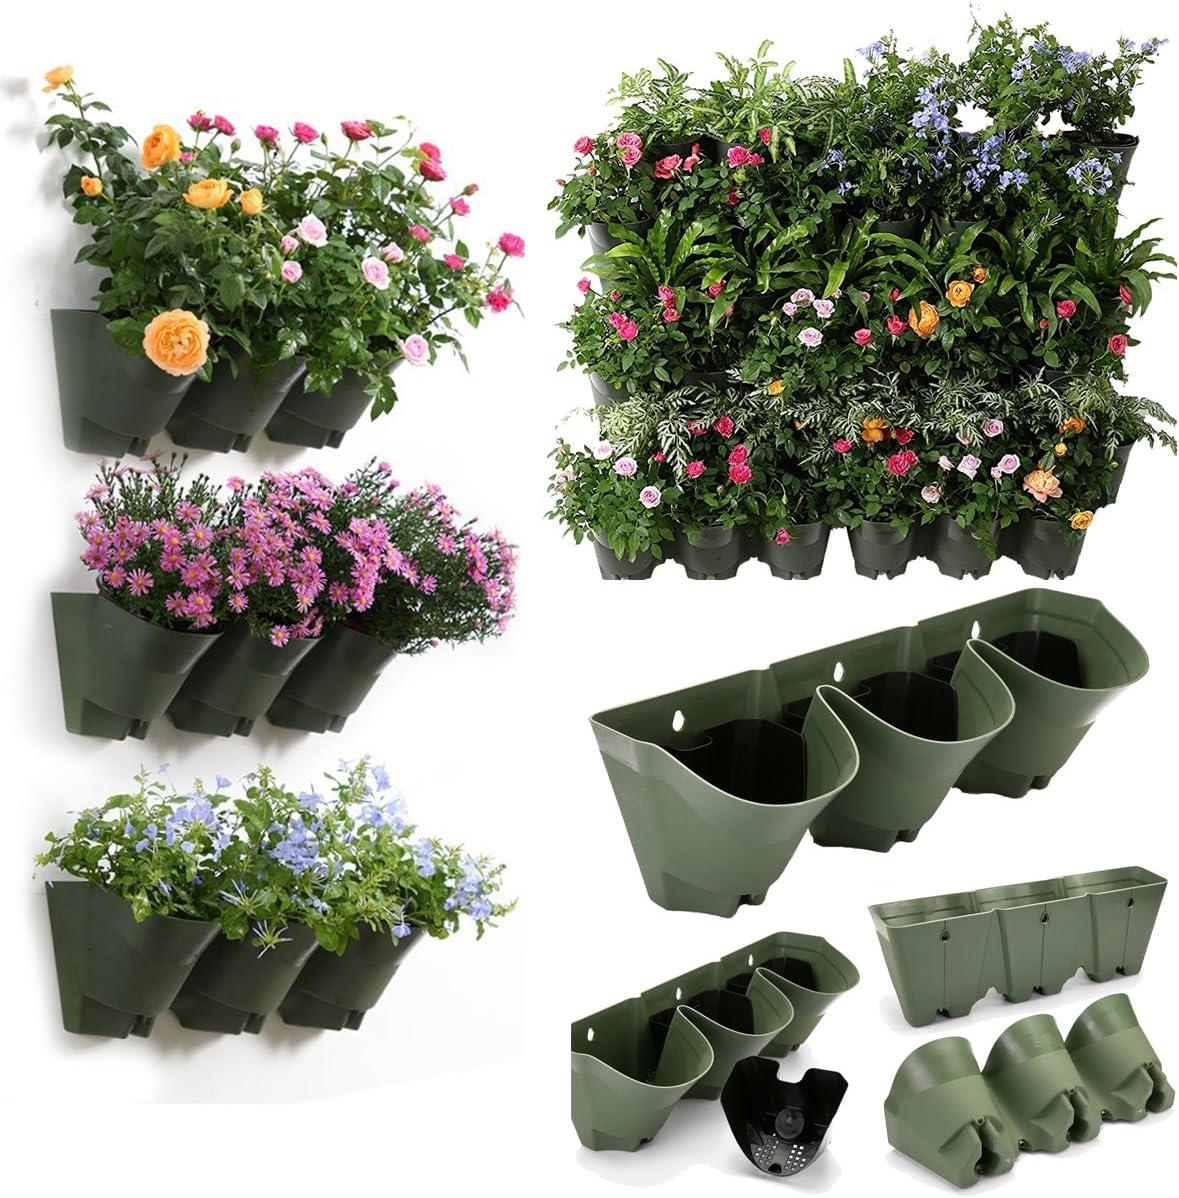 Sungmor 9 Pockets Vertical Planter,Living Wall Hanging Pots,Worth Garden Self Watering Flower Pot,Indoor Outdoor Wall & Rail & Fence Decoration